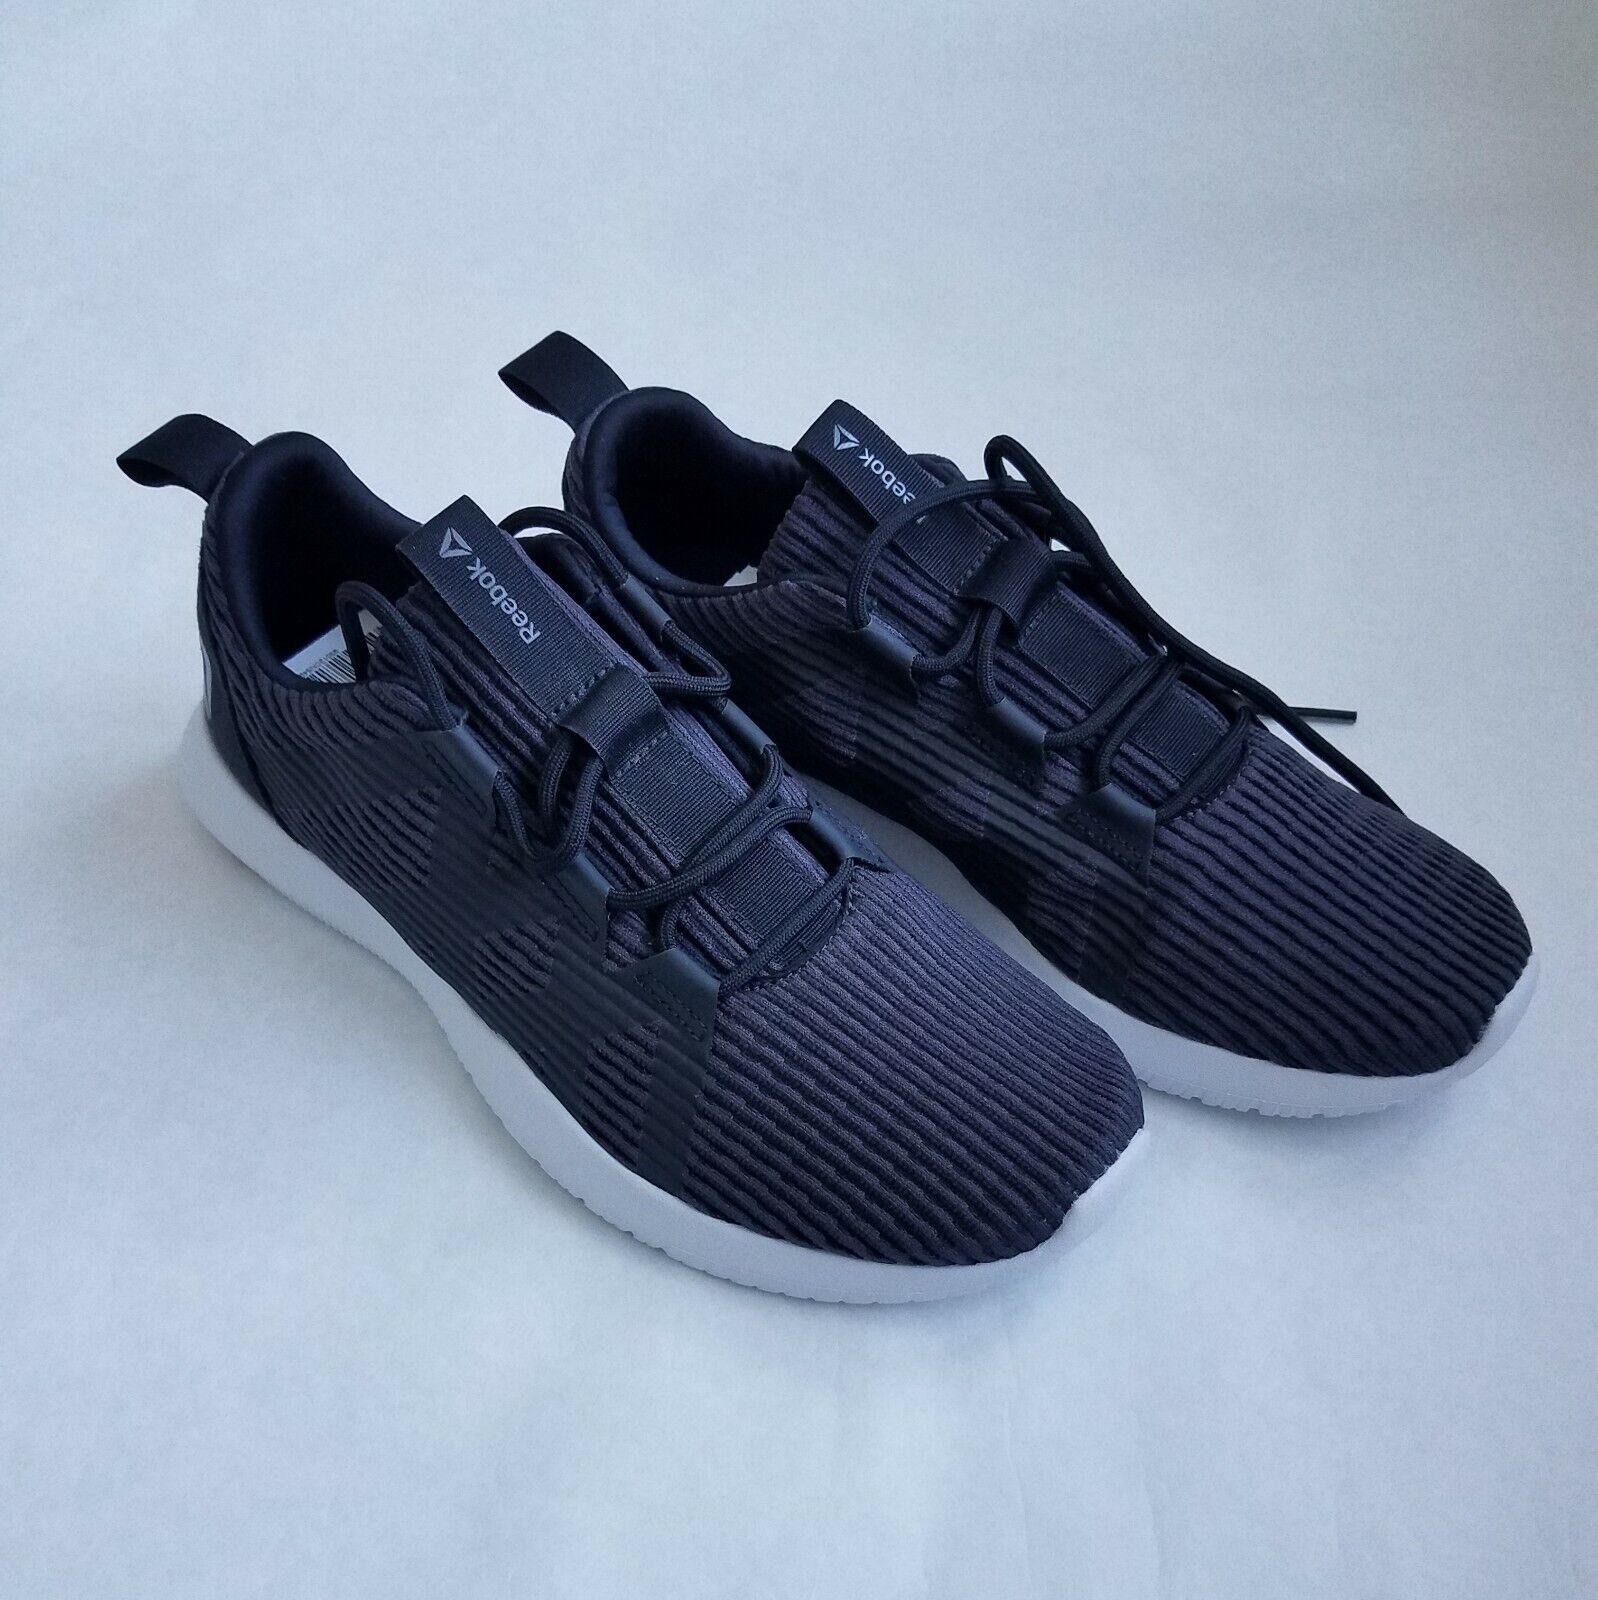 8c0184b2db50 Reebok Pulse Mens shoes Size 9 Cross training Sneaker Reago New  nugkxa2950-Men s Trainers